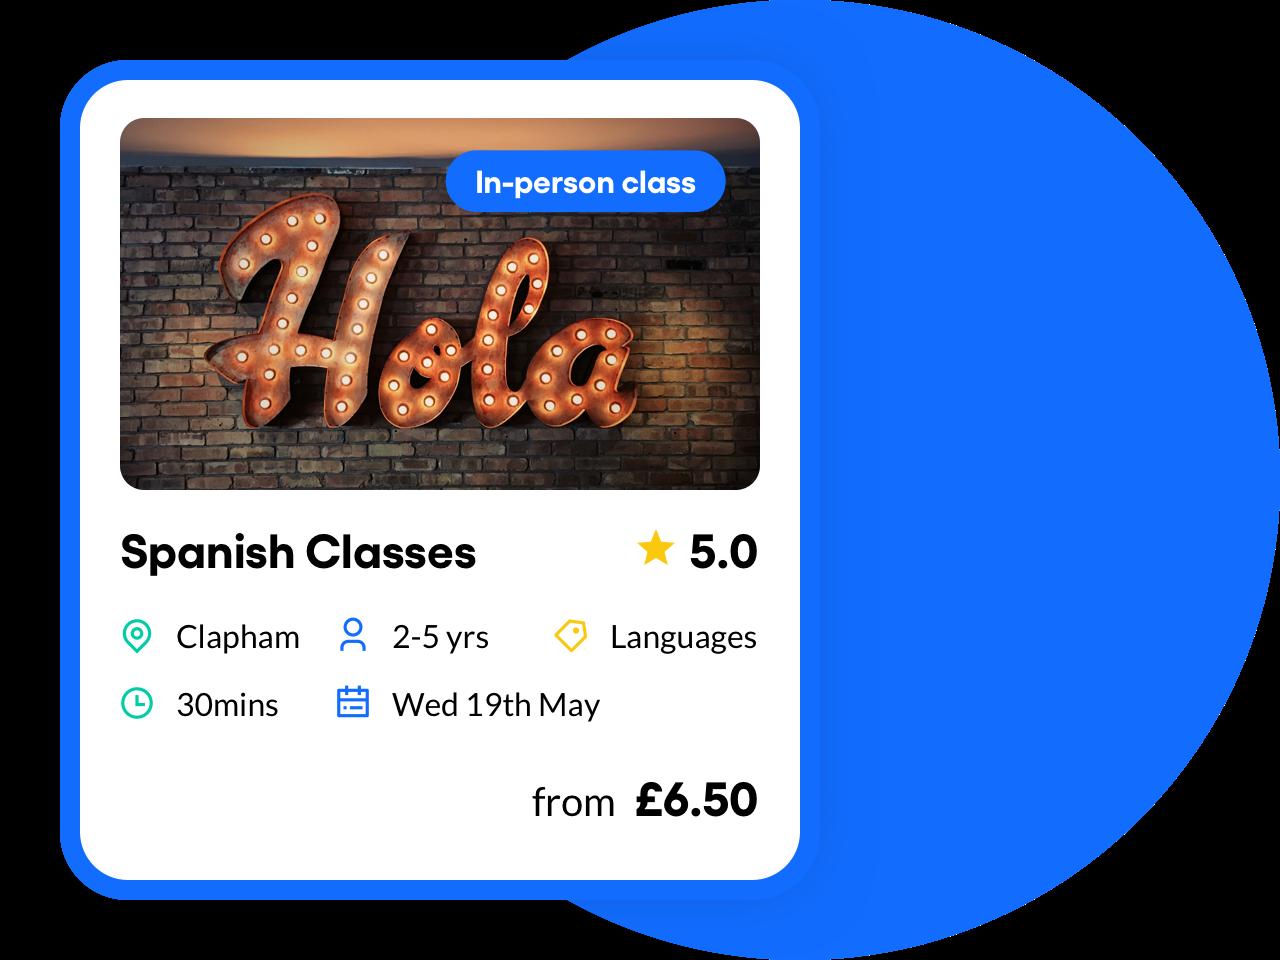 Spanish Classes feature image